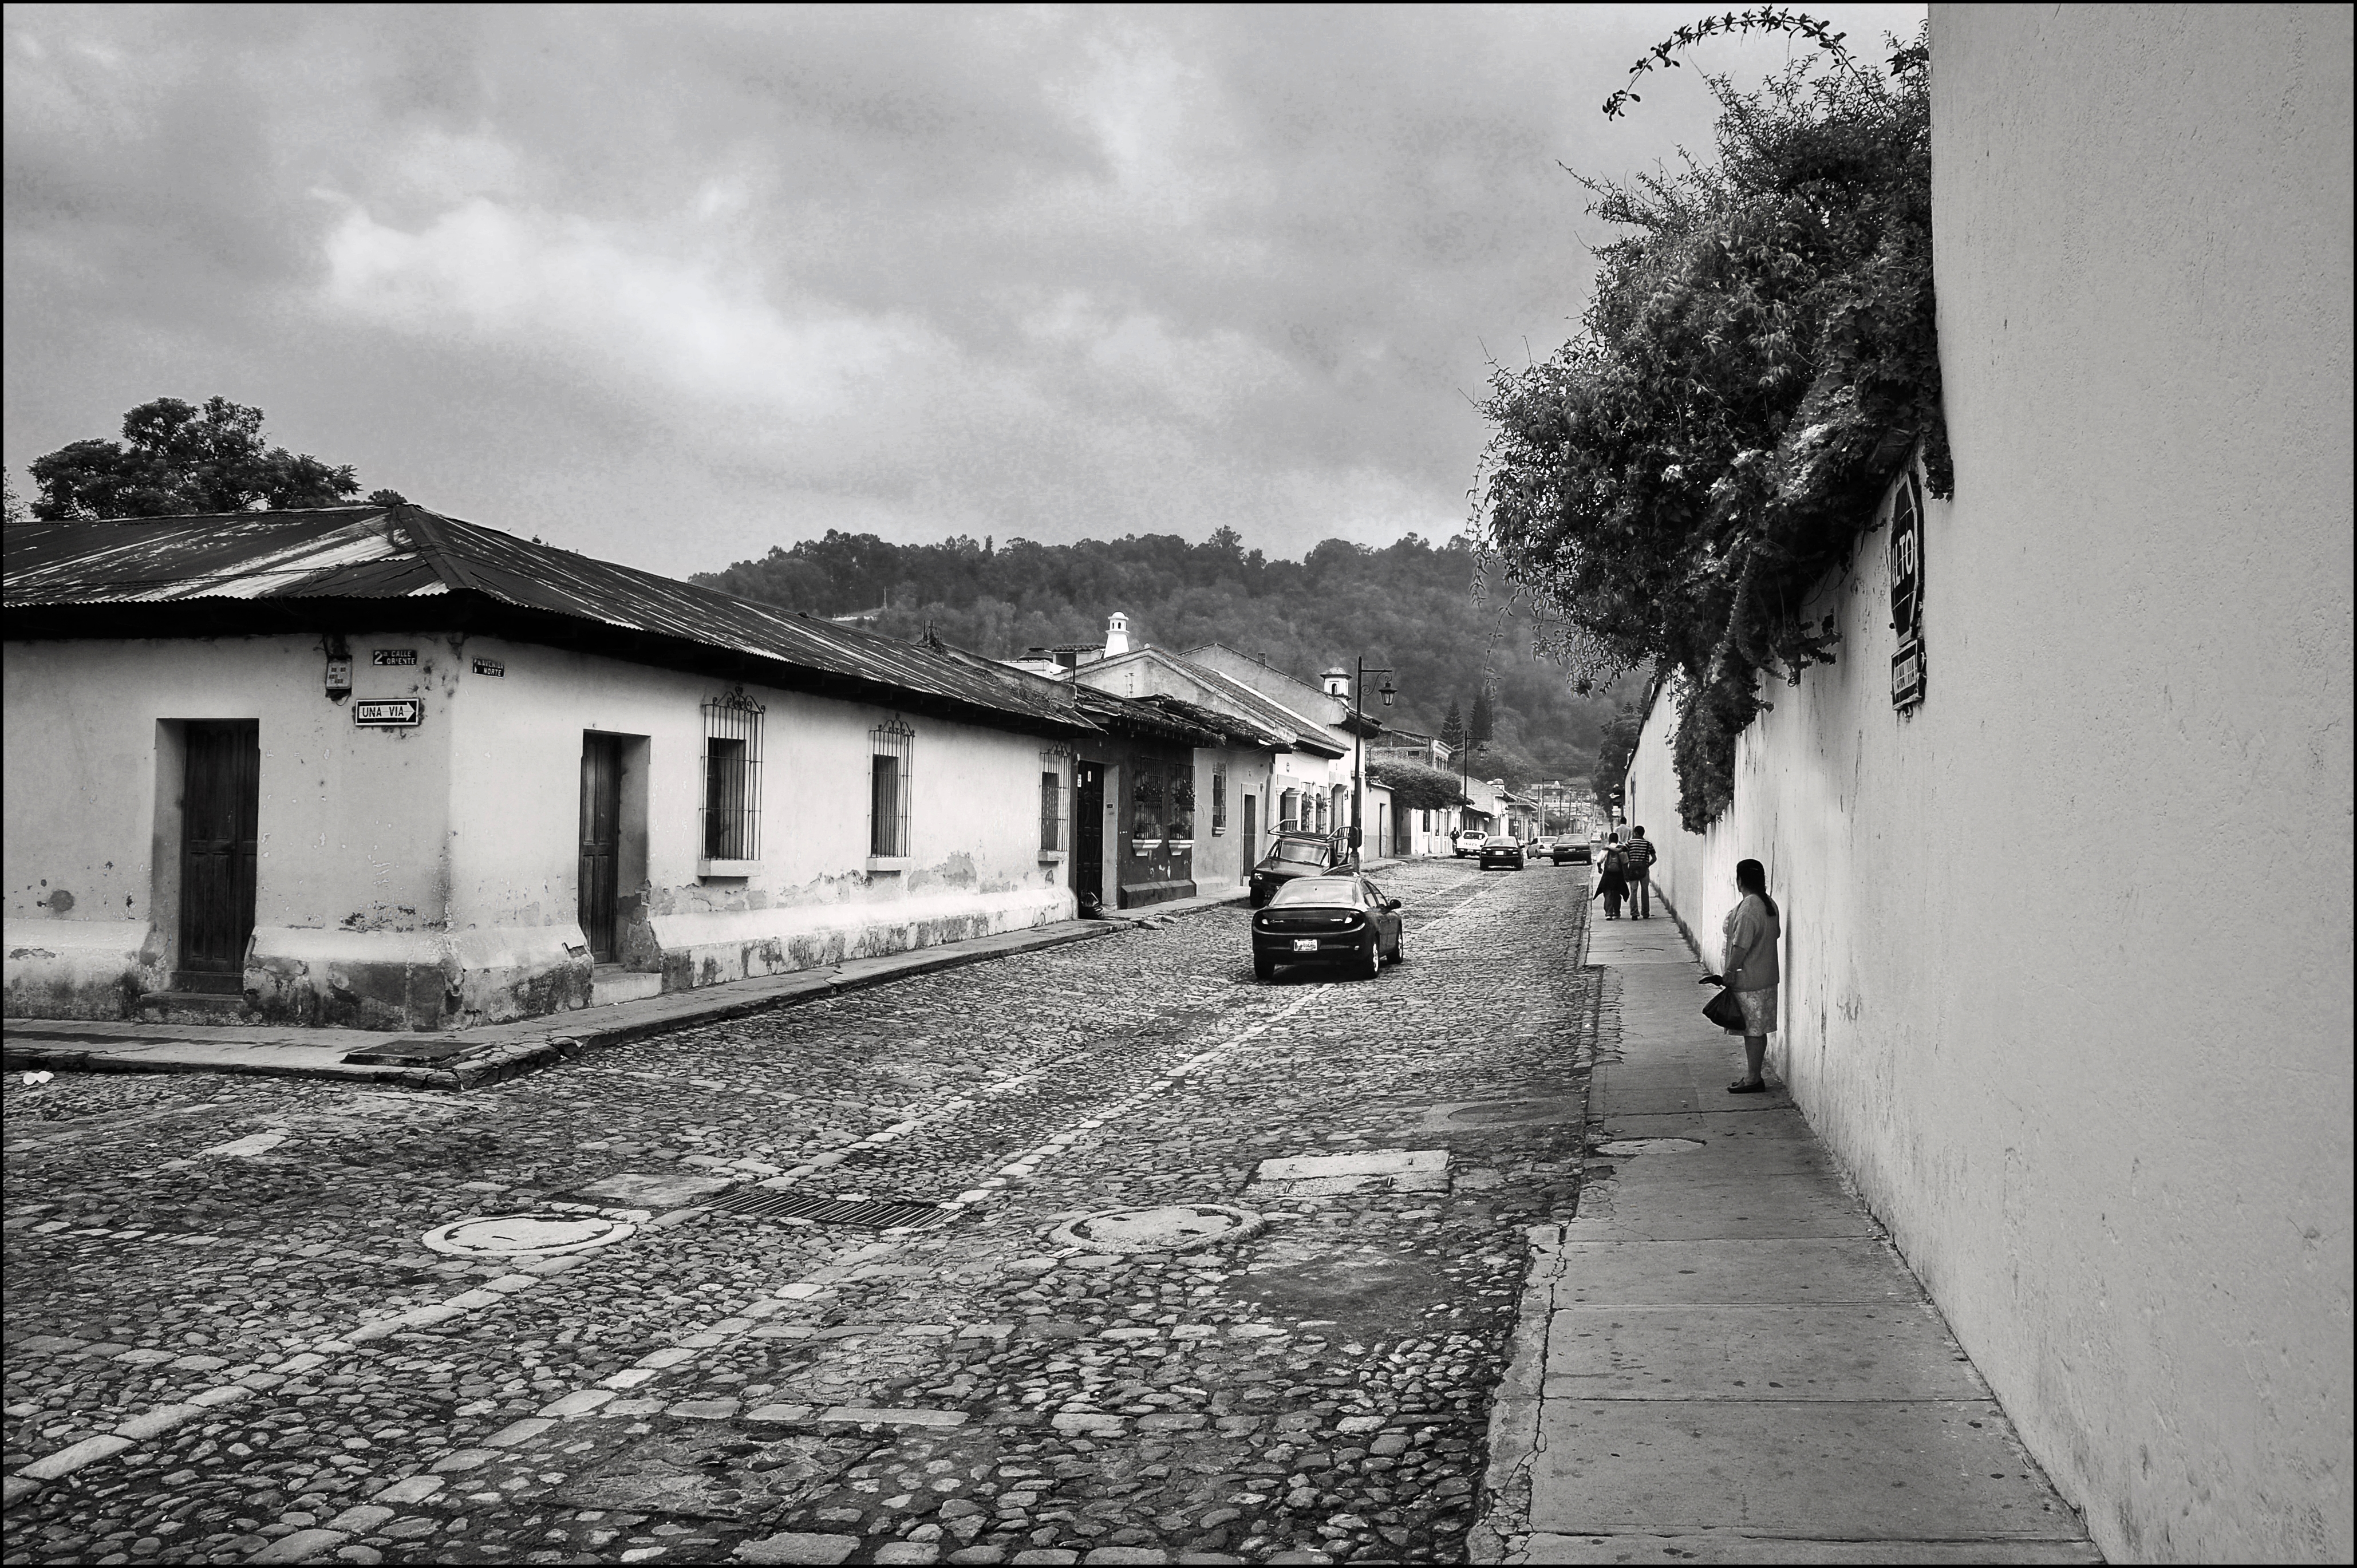 Calles de Antigua bicolor